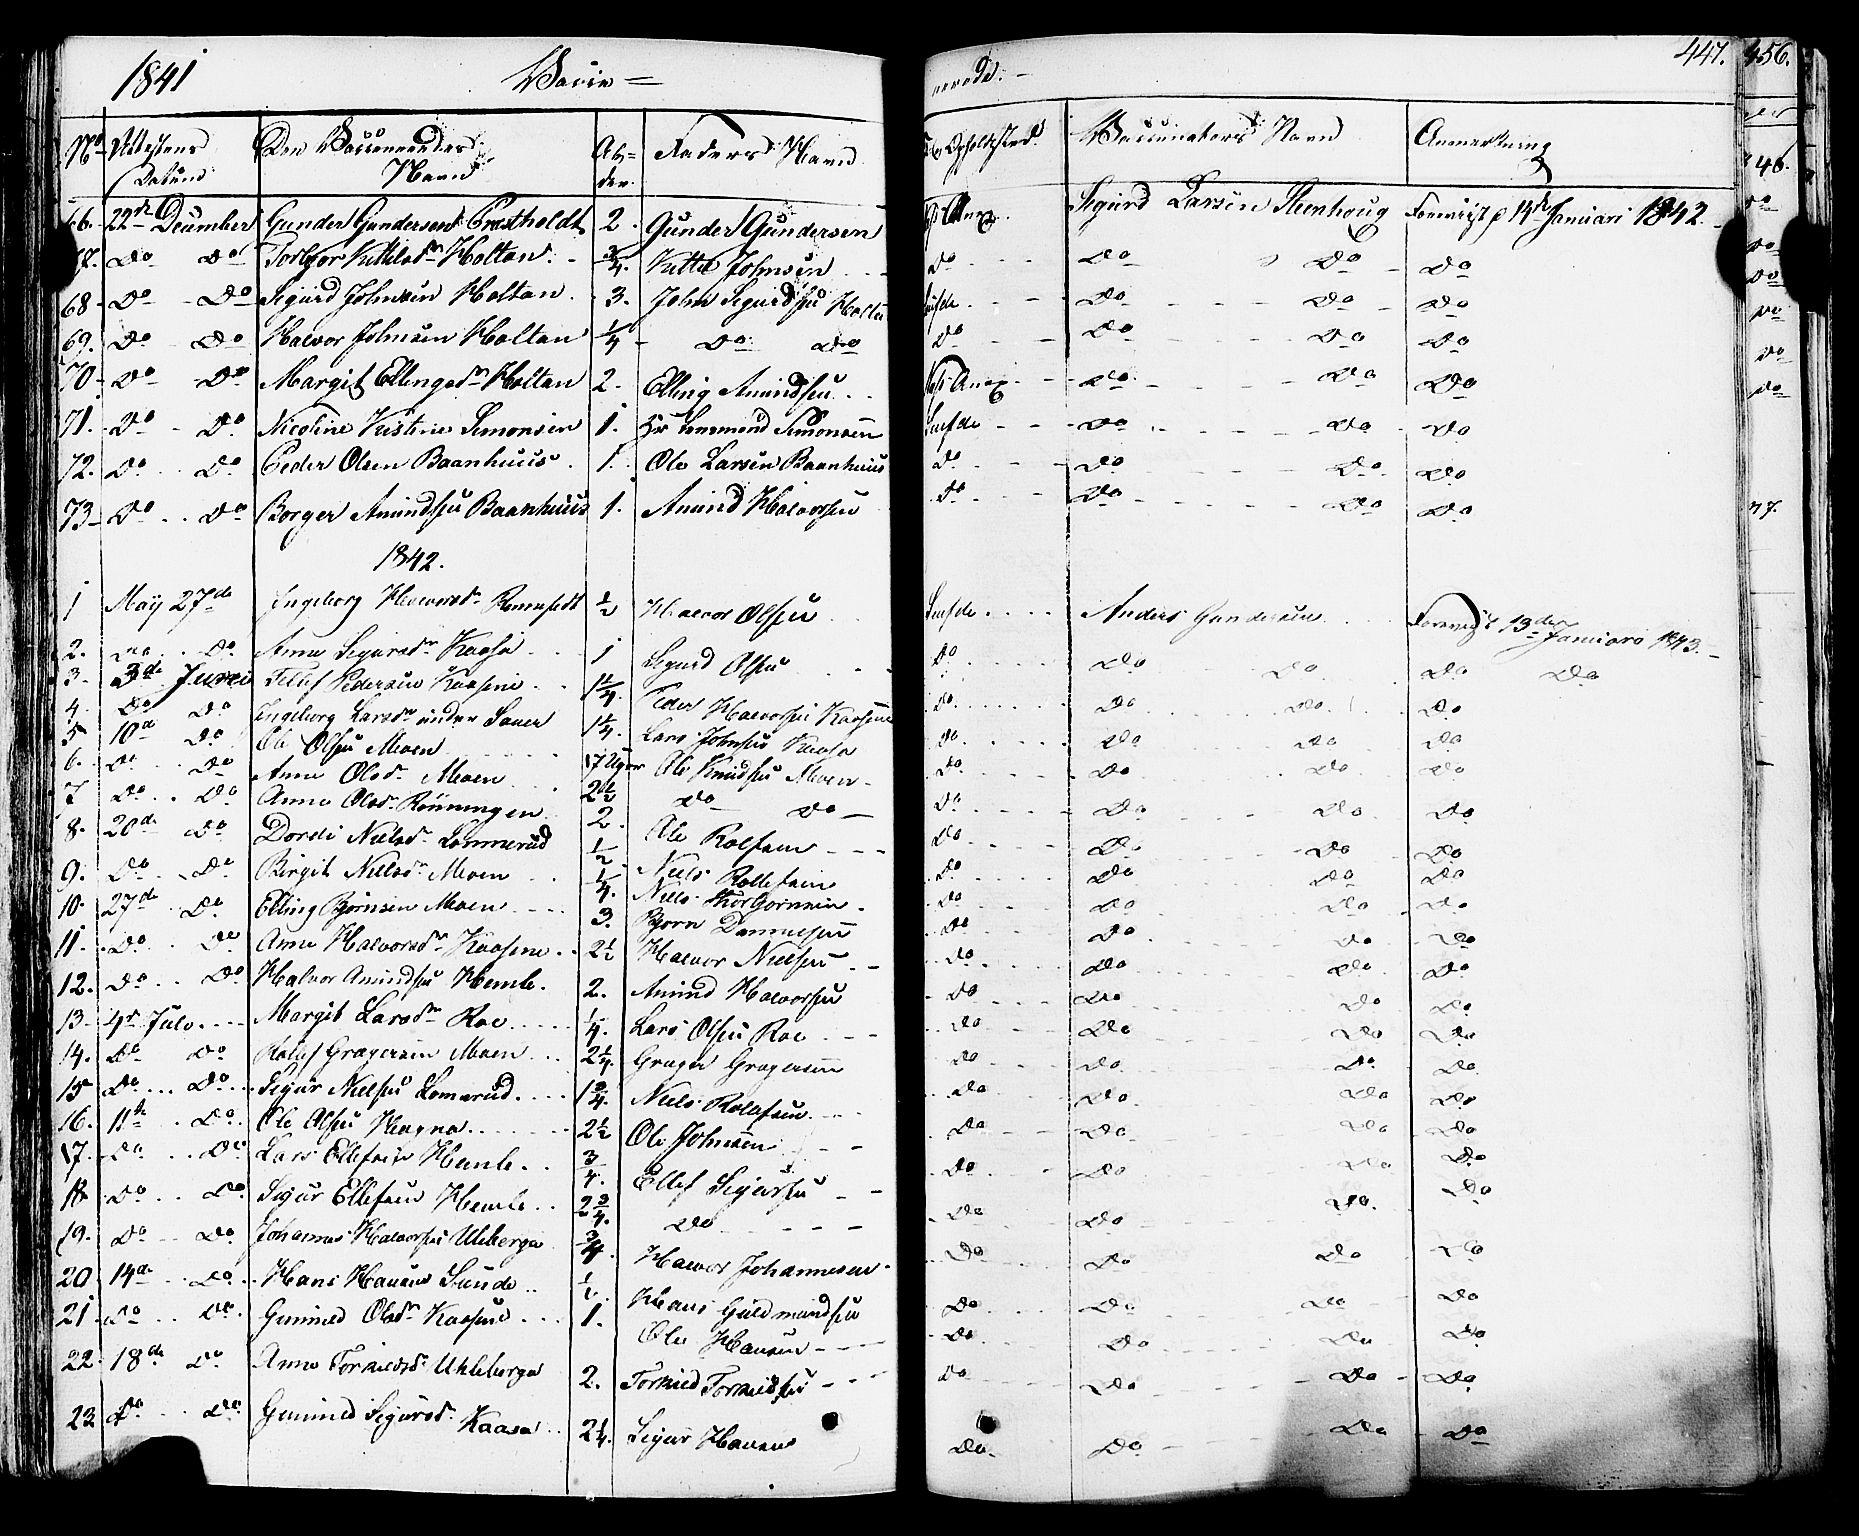 SAKO, Sauherad kirkebøker, F/Fa/L0006: Ministerialbok nr. I 6, 1827-1850, s. 447